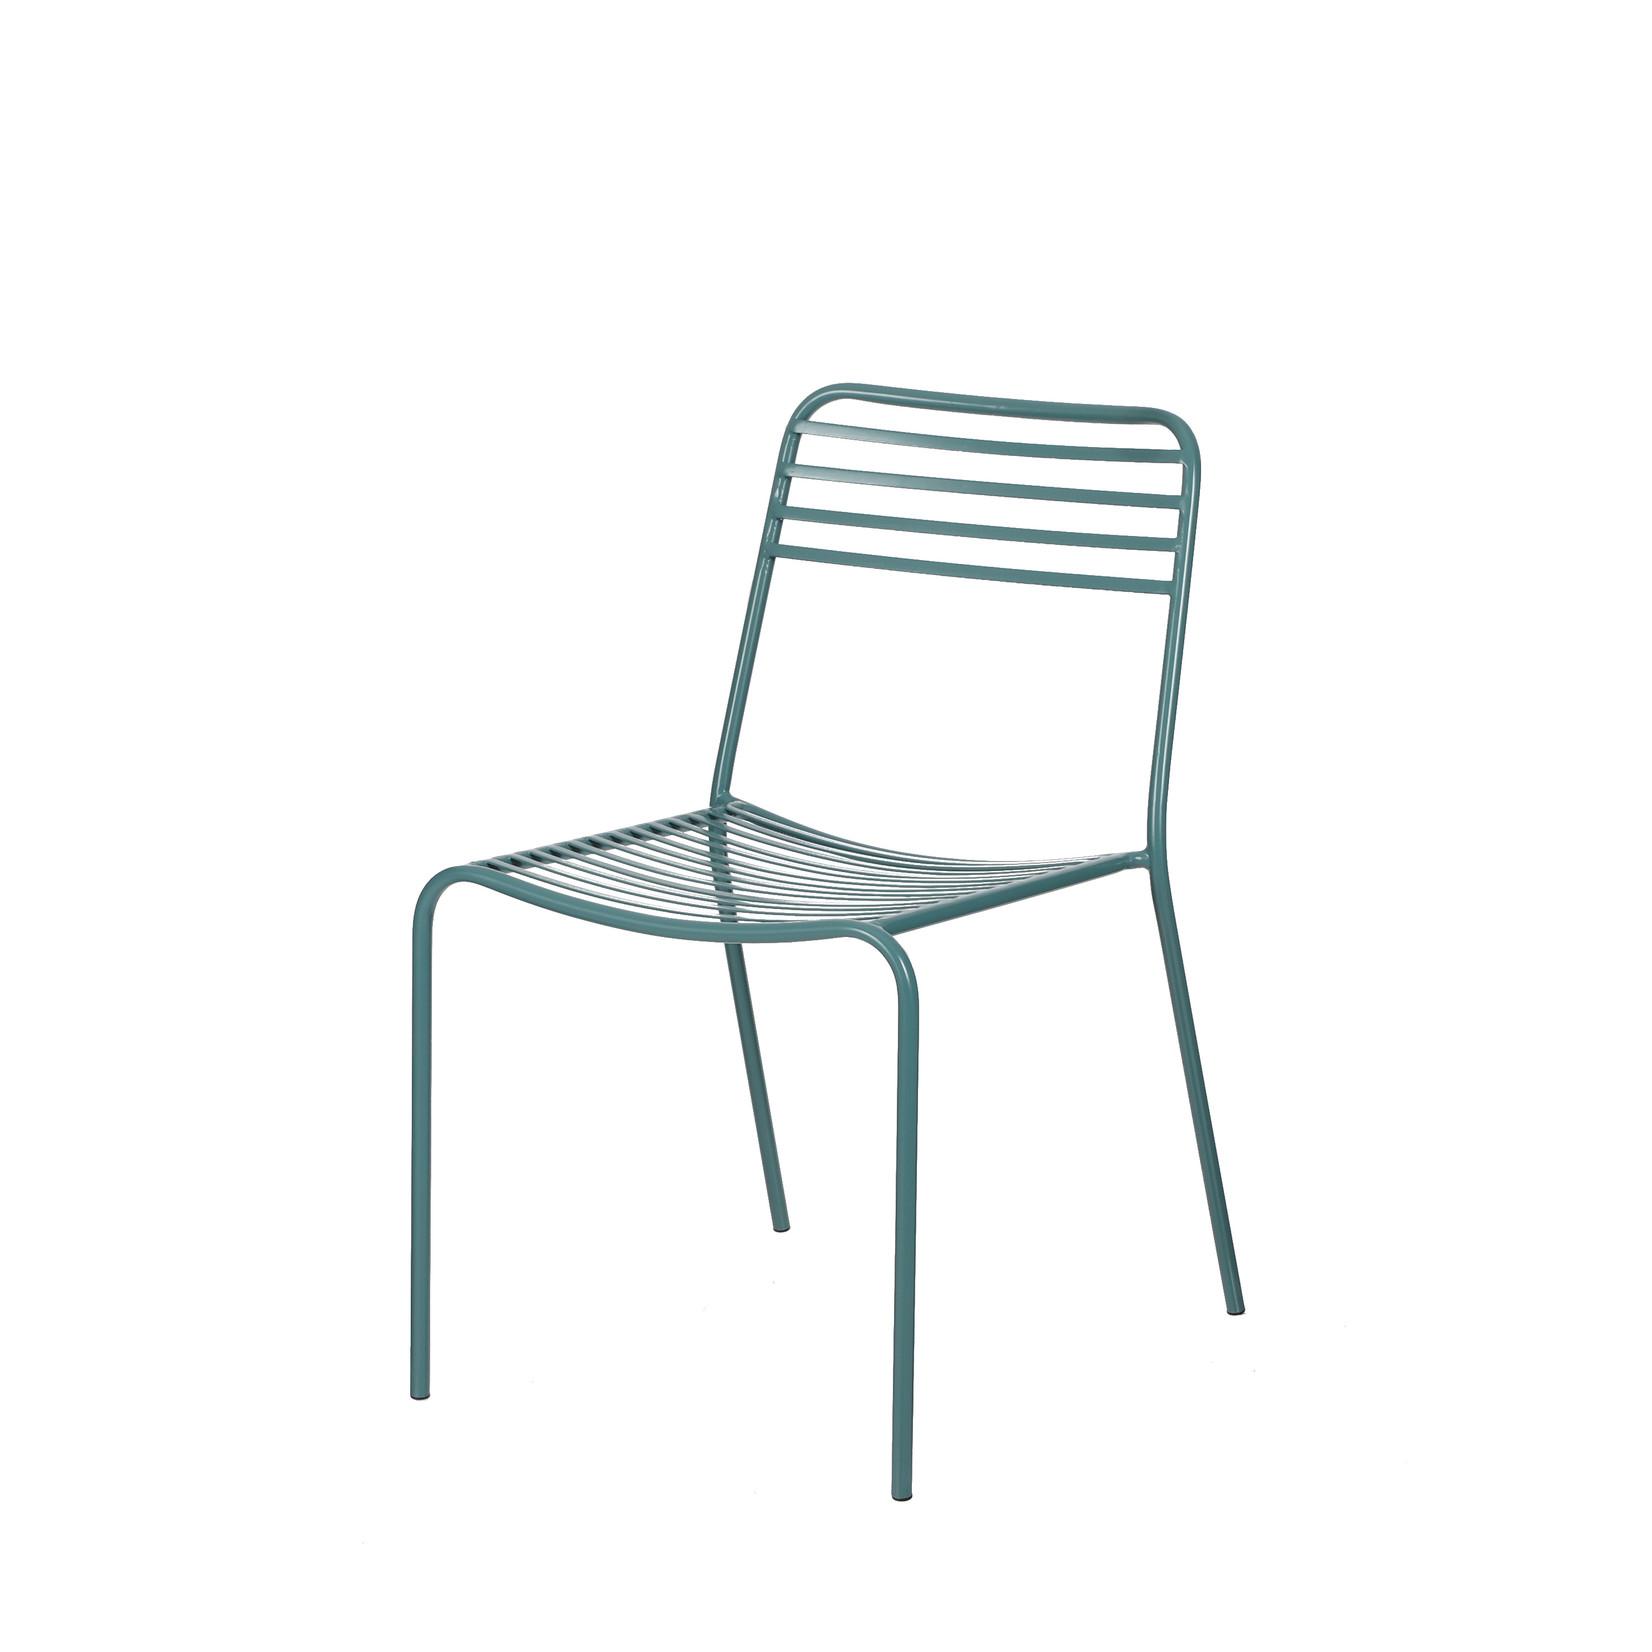 MiCa 1073752 Tula chair blue